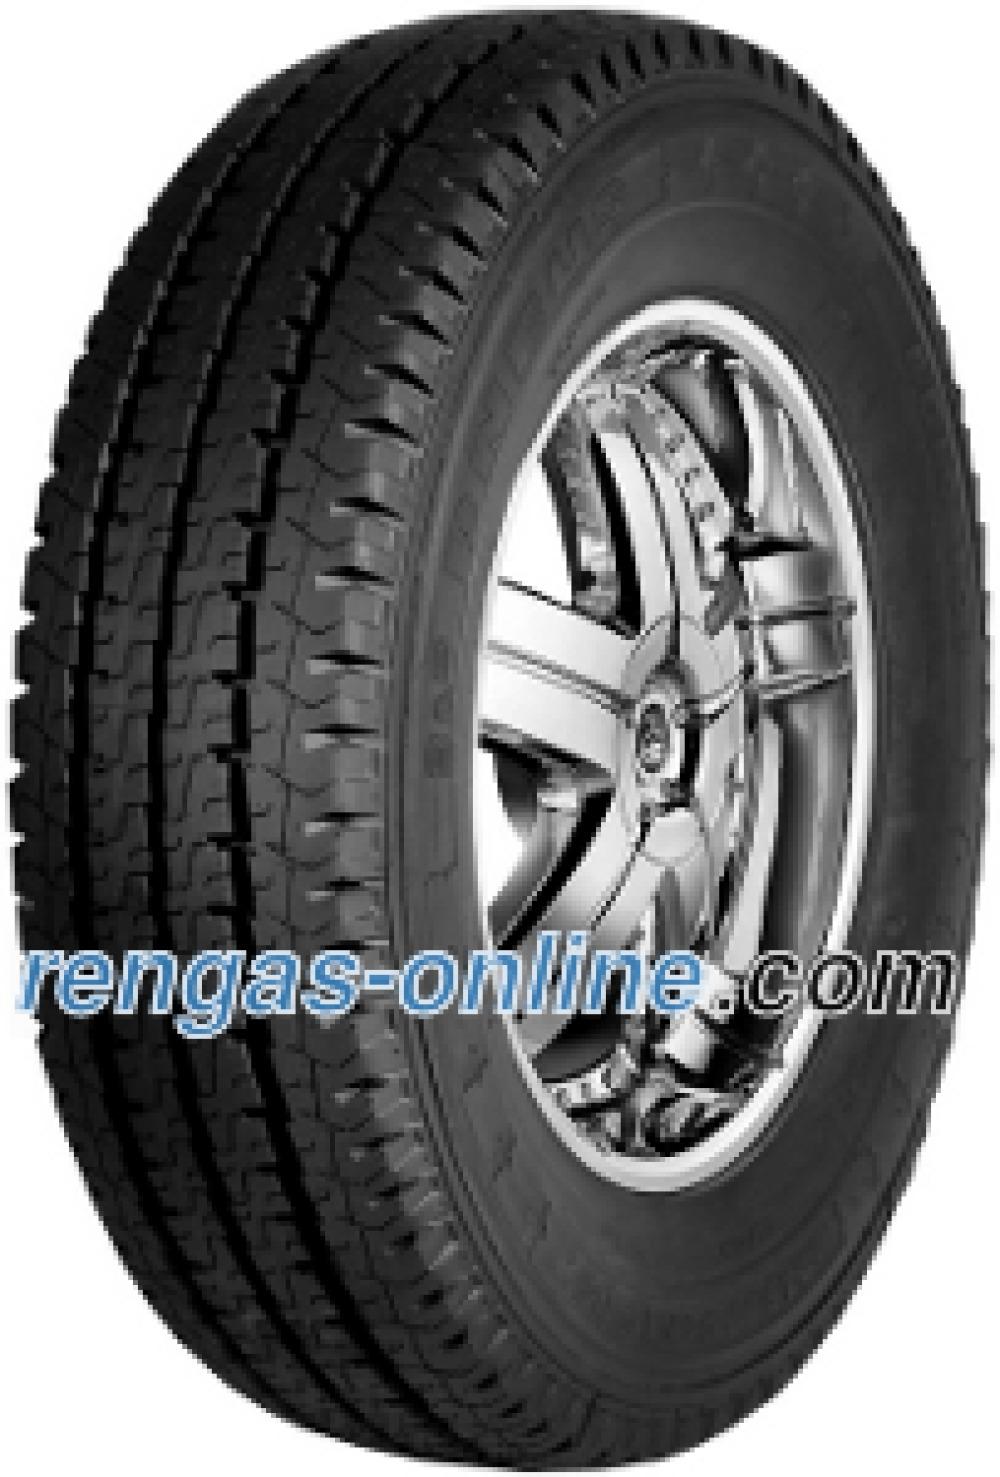 radburg-agis-101-21565-r16c-113111n-pinnoitettu